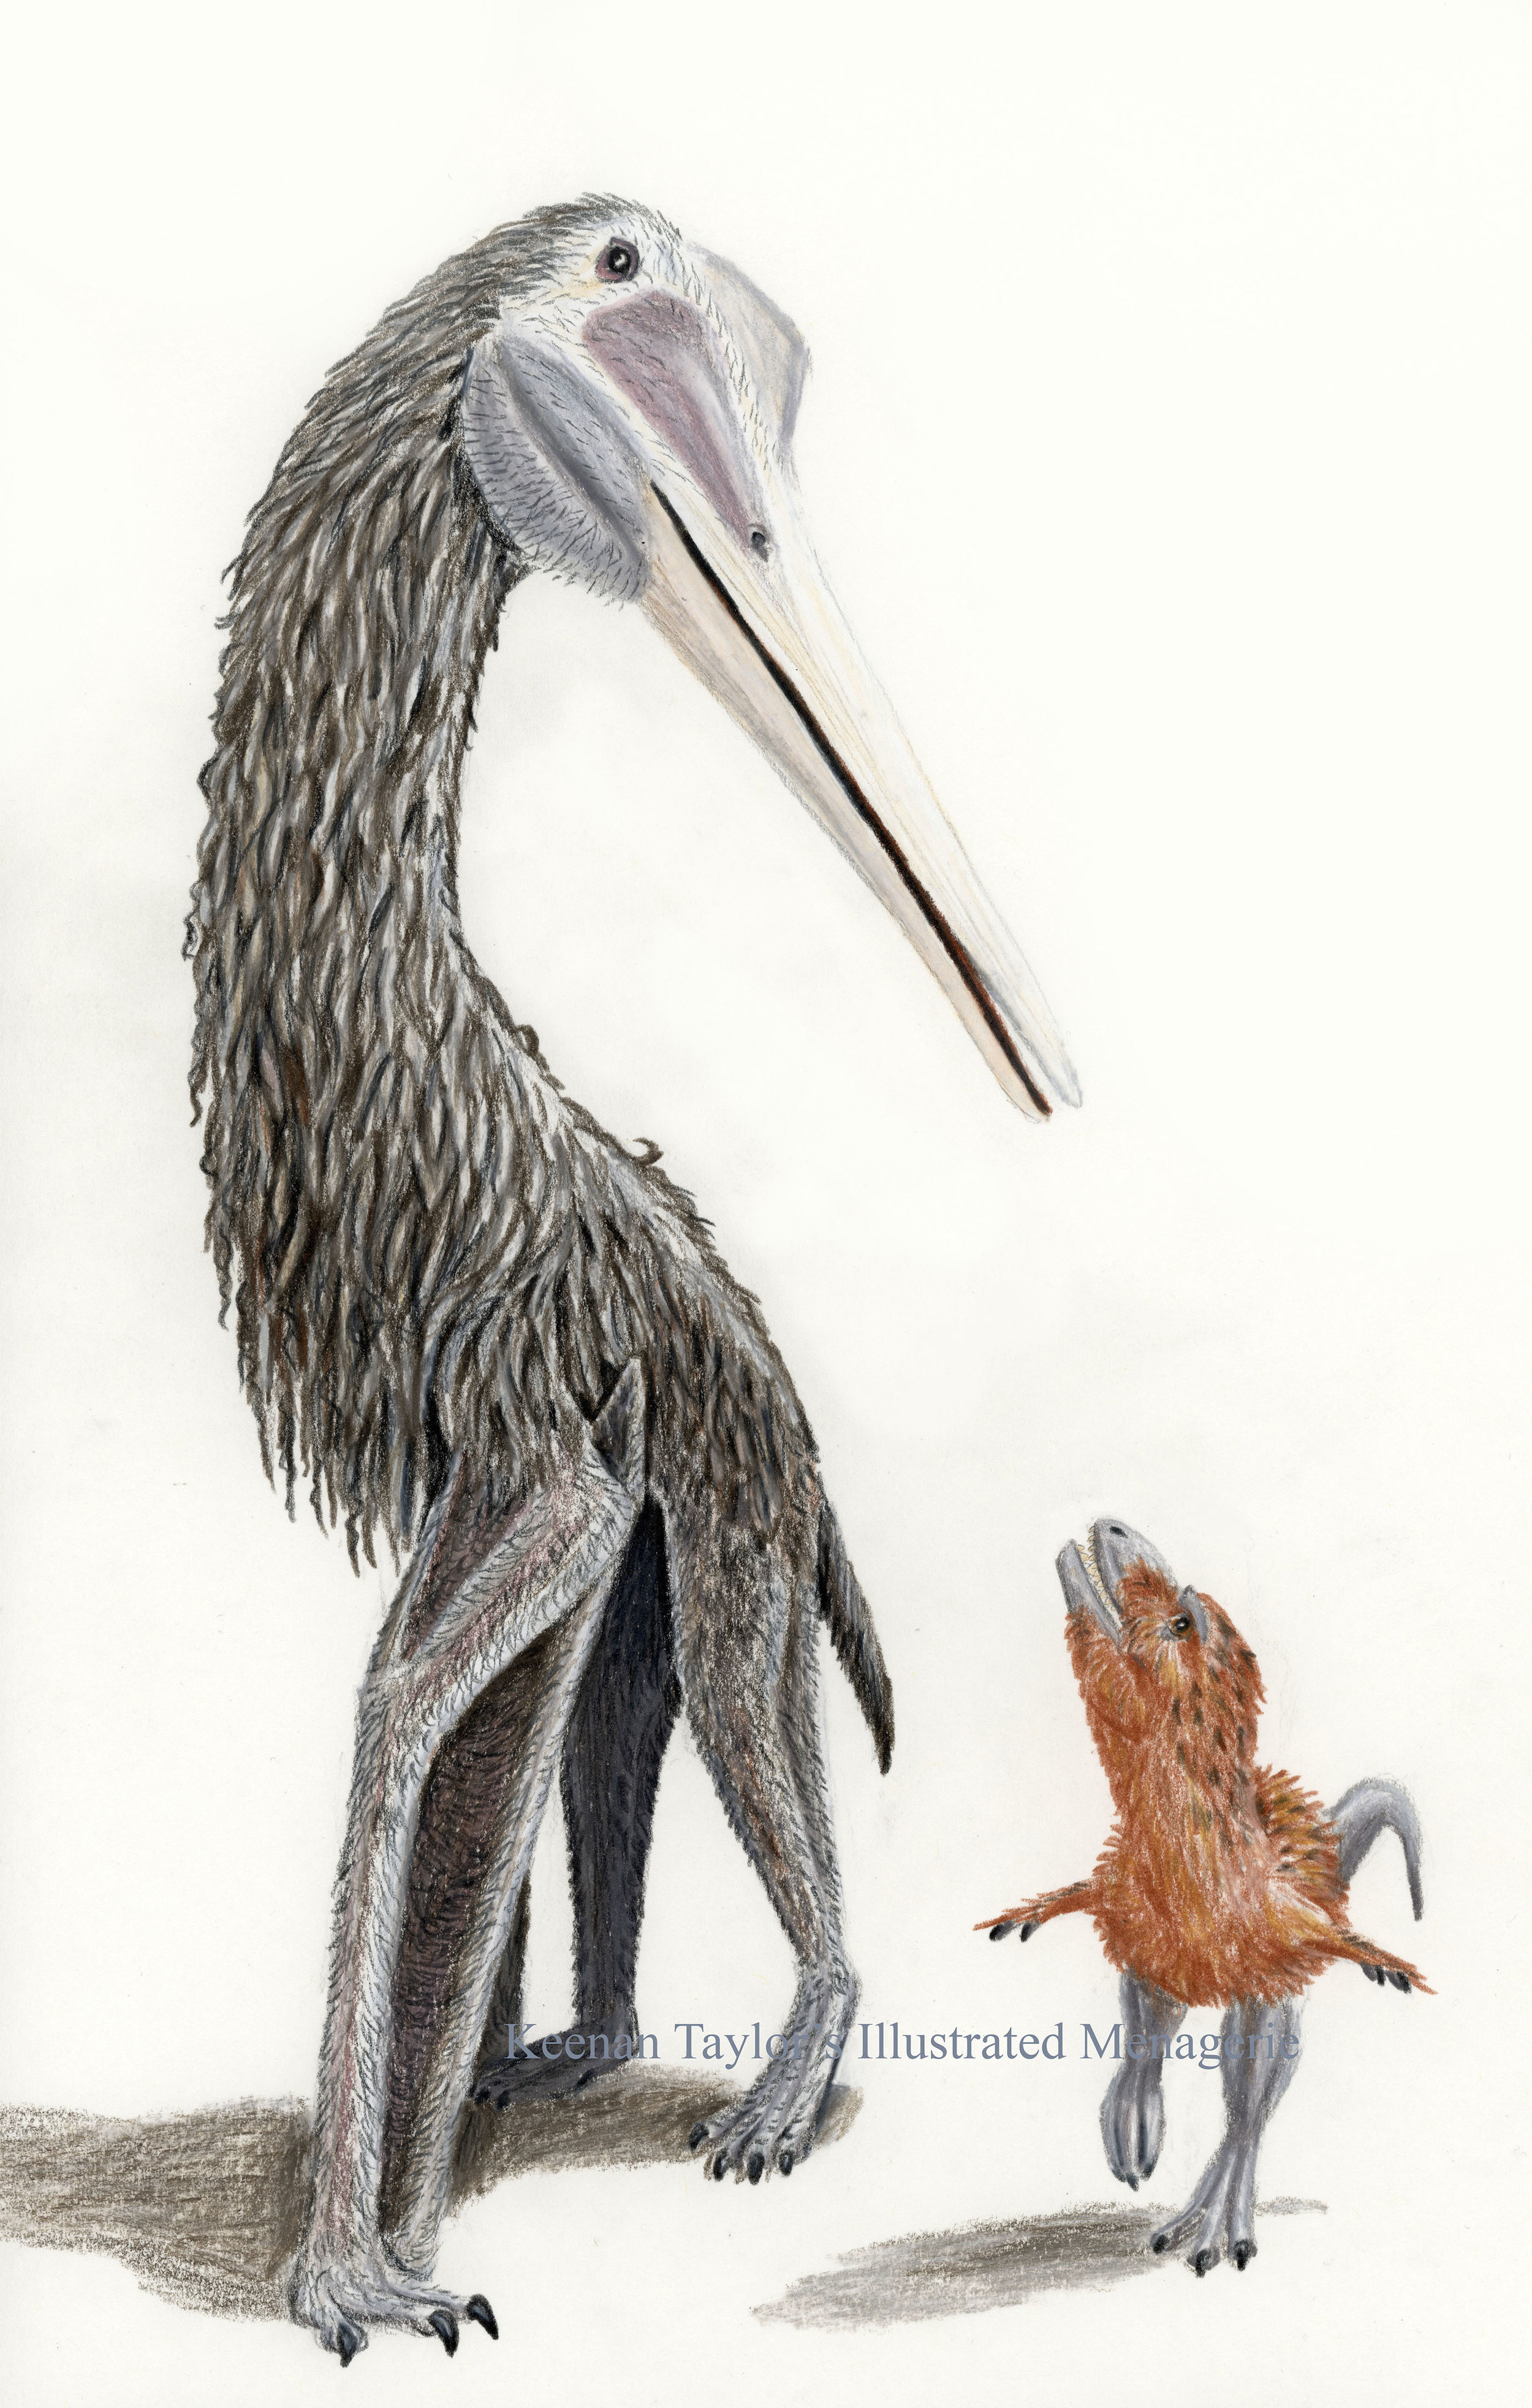 Quetzalcoatlus northropi and young Tyrannosaurus rex